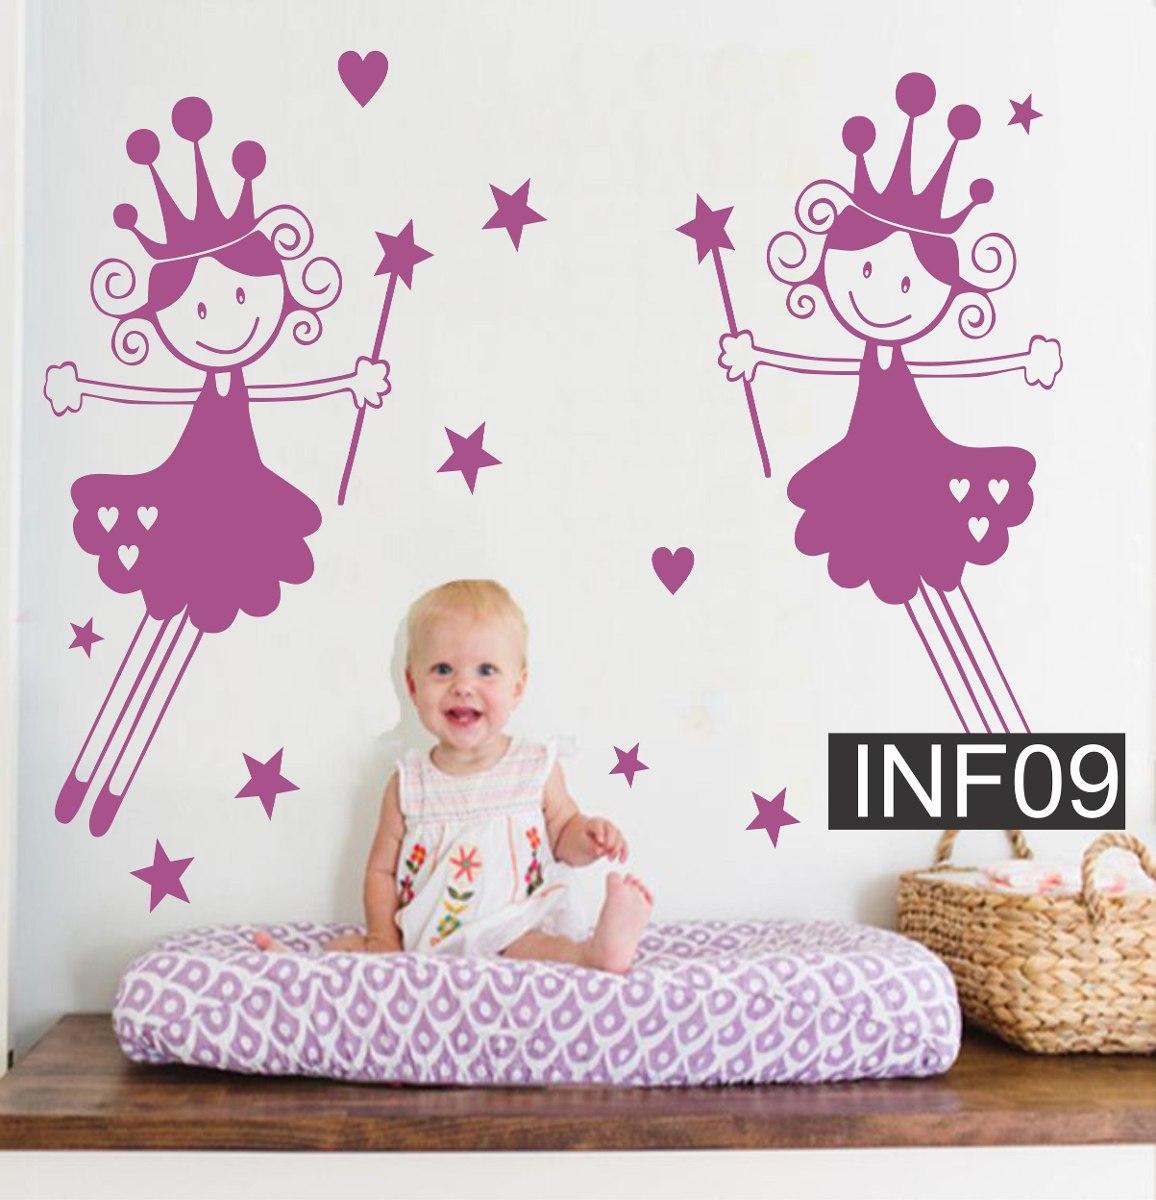 Hadas Vinilos Decorativos Infantiles.Vinilos Decorativos Infantiles Princesa Hada Para Bebe Nena